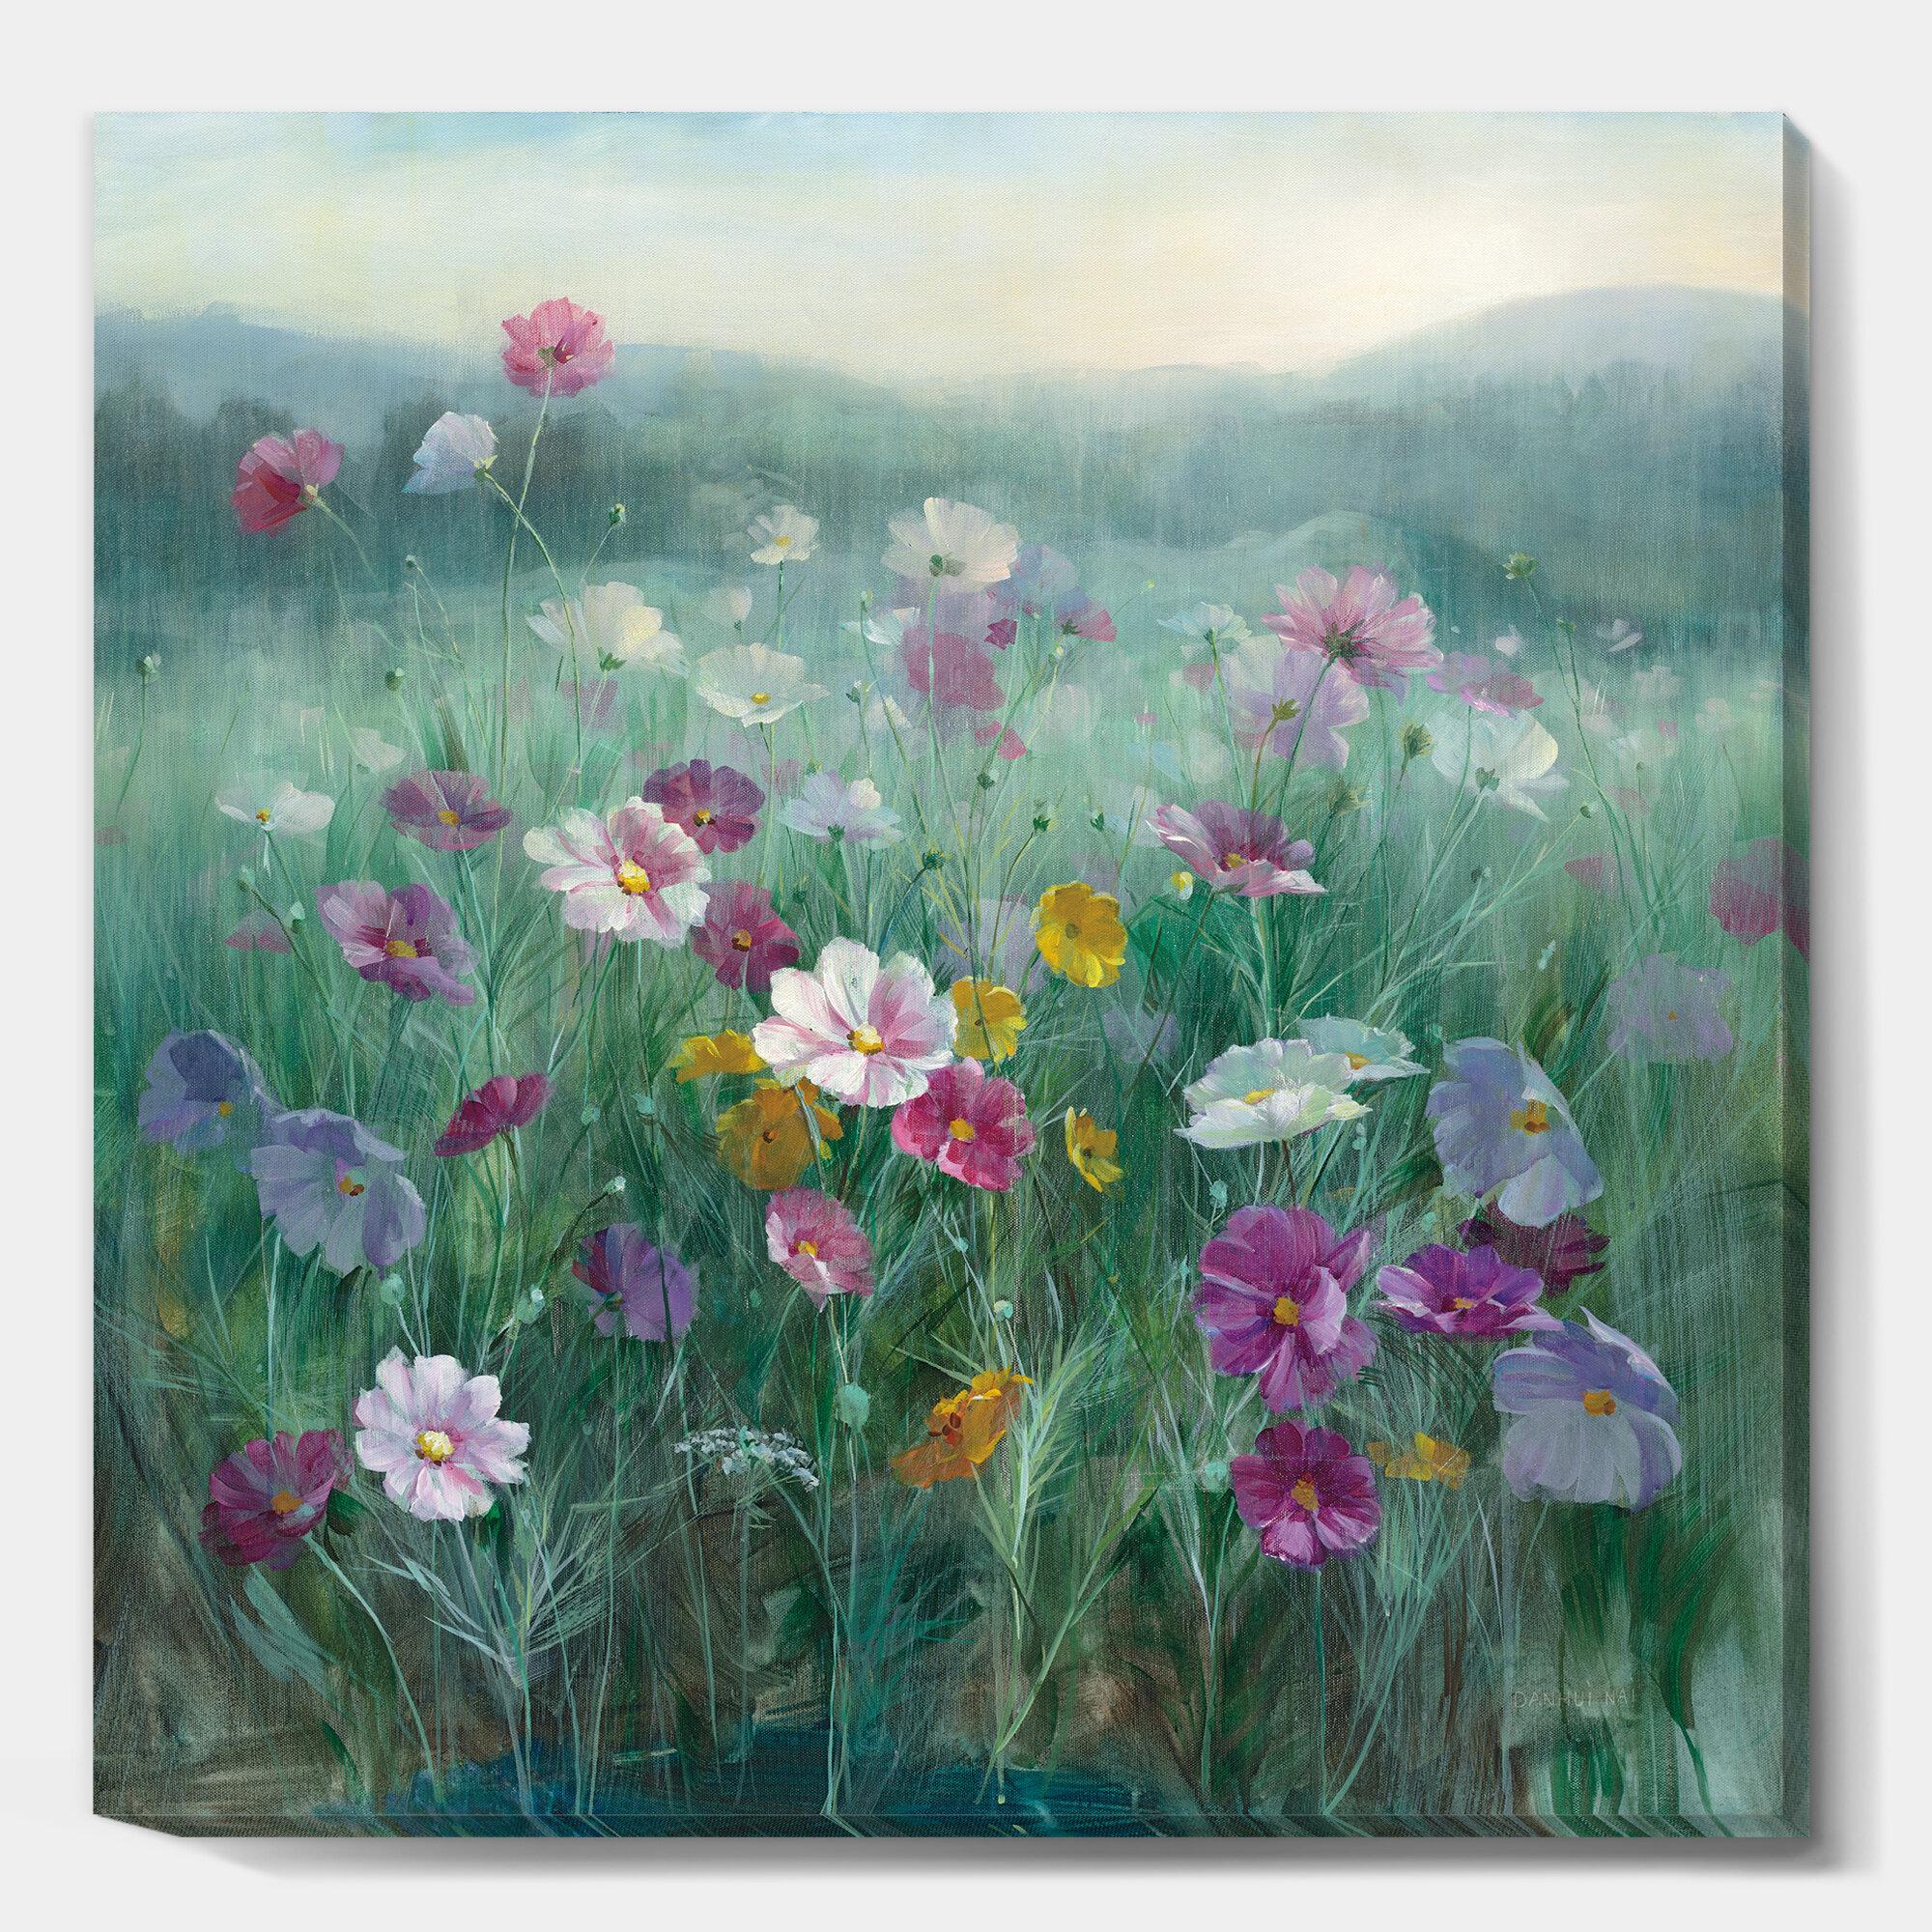 East Urban Home Flower Field Painting Print On Canvas Wayfair